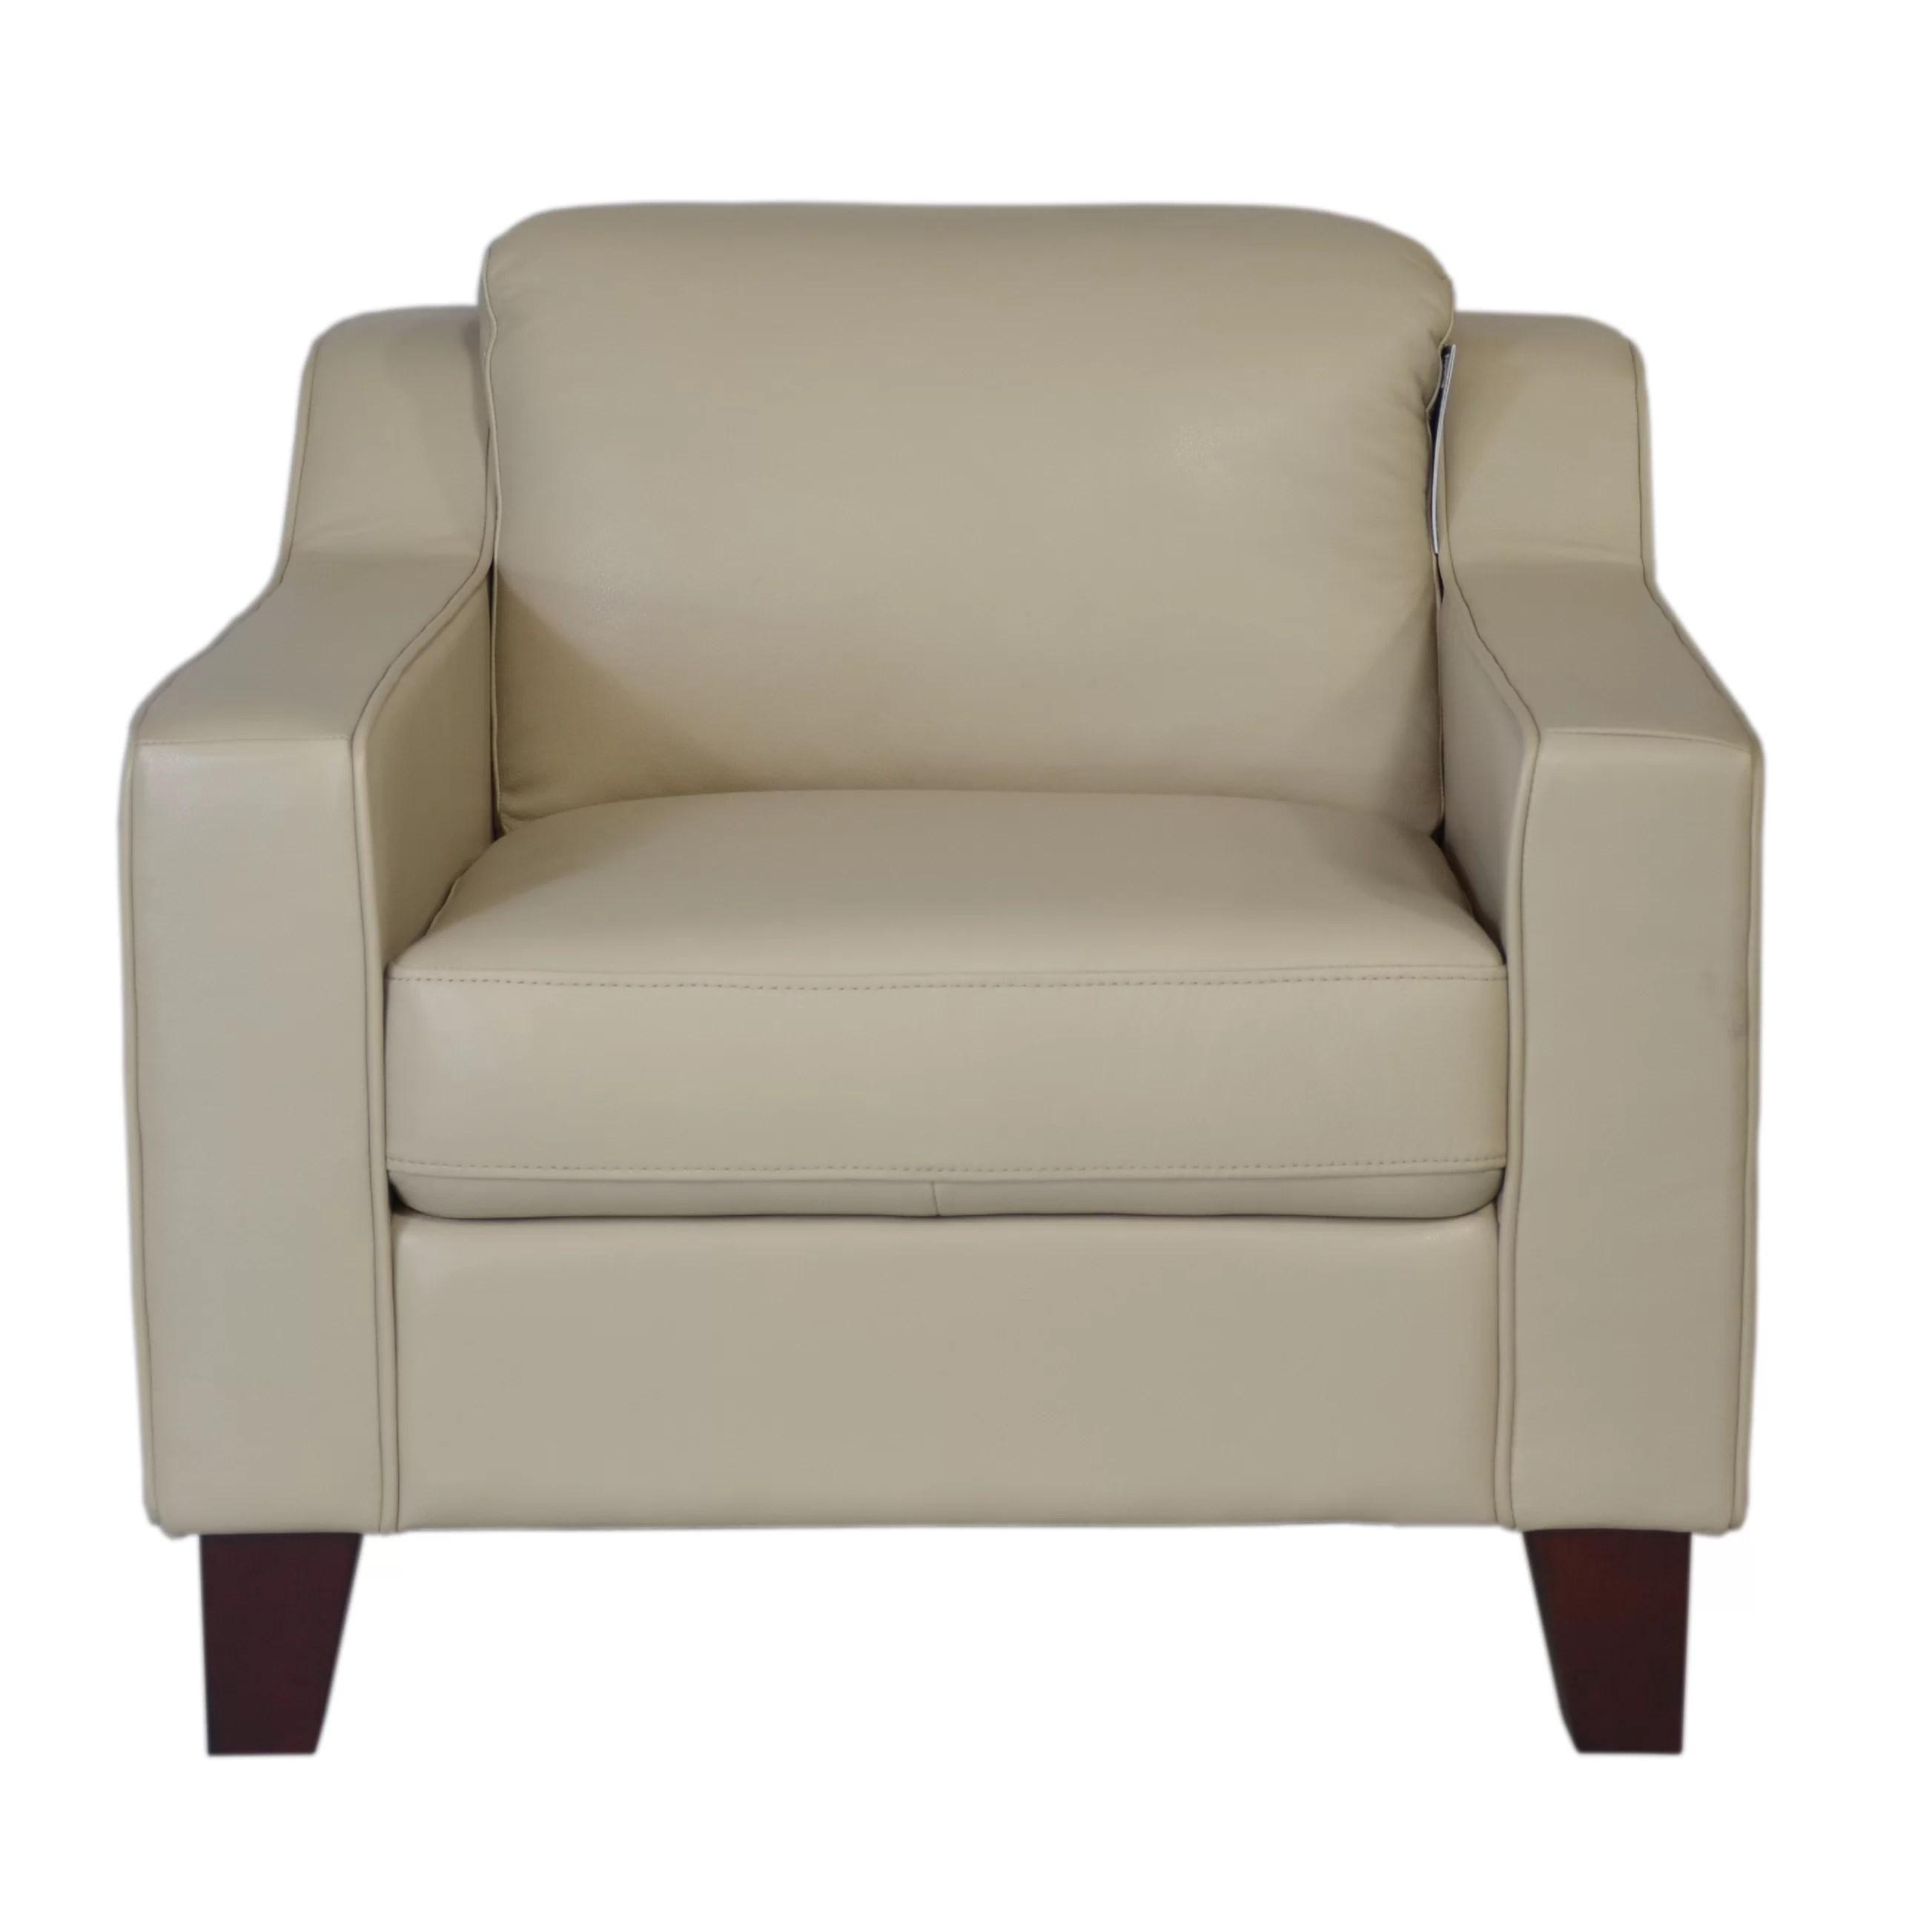 full grain leather chair stool build moroni cora top wayfair